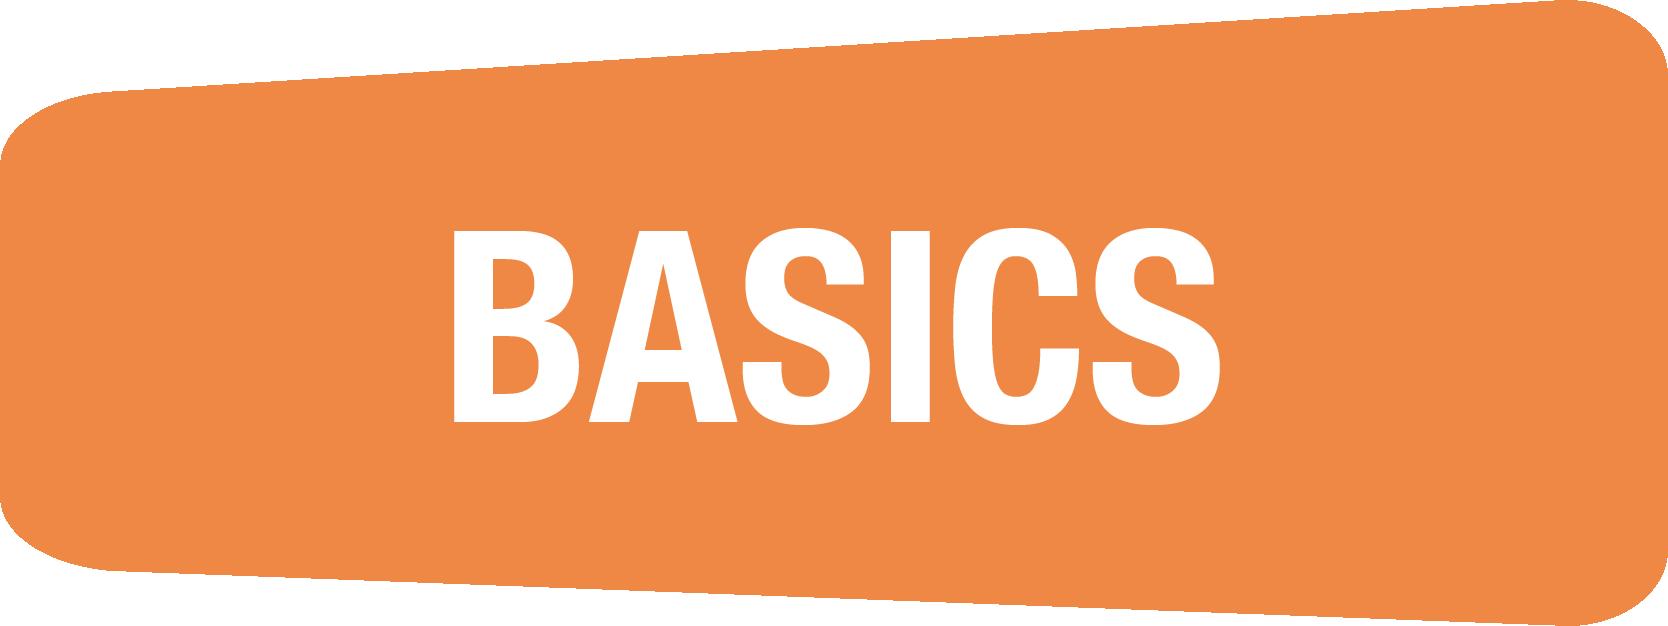 CyberPass Basics logo